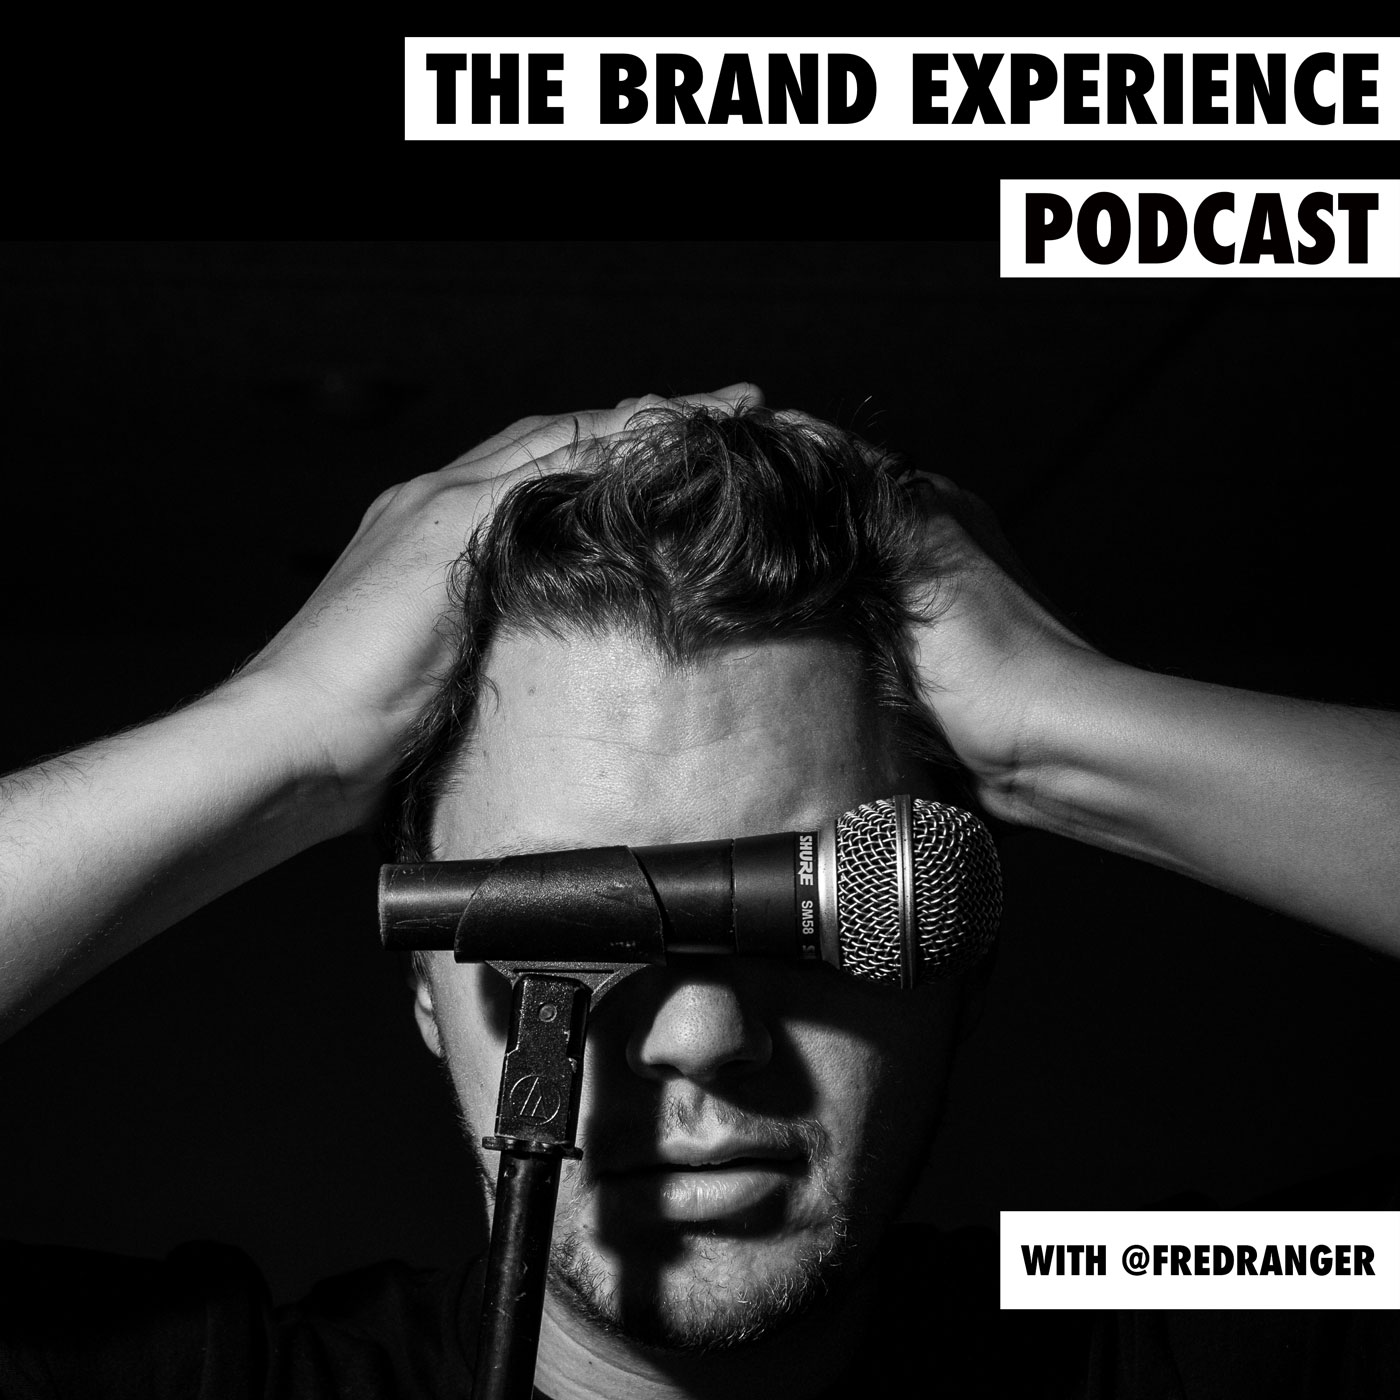 The-Brand-Experience-Art-1400.jpg